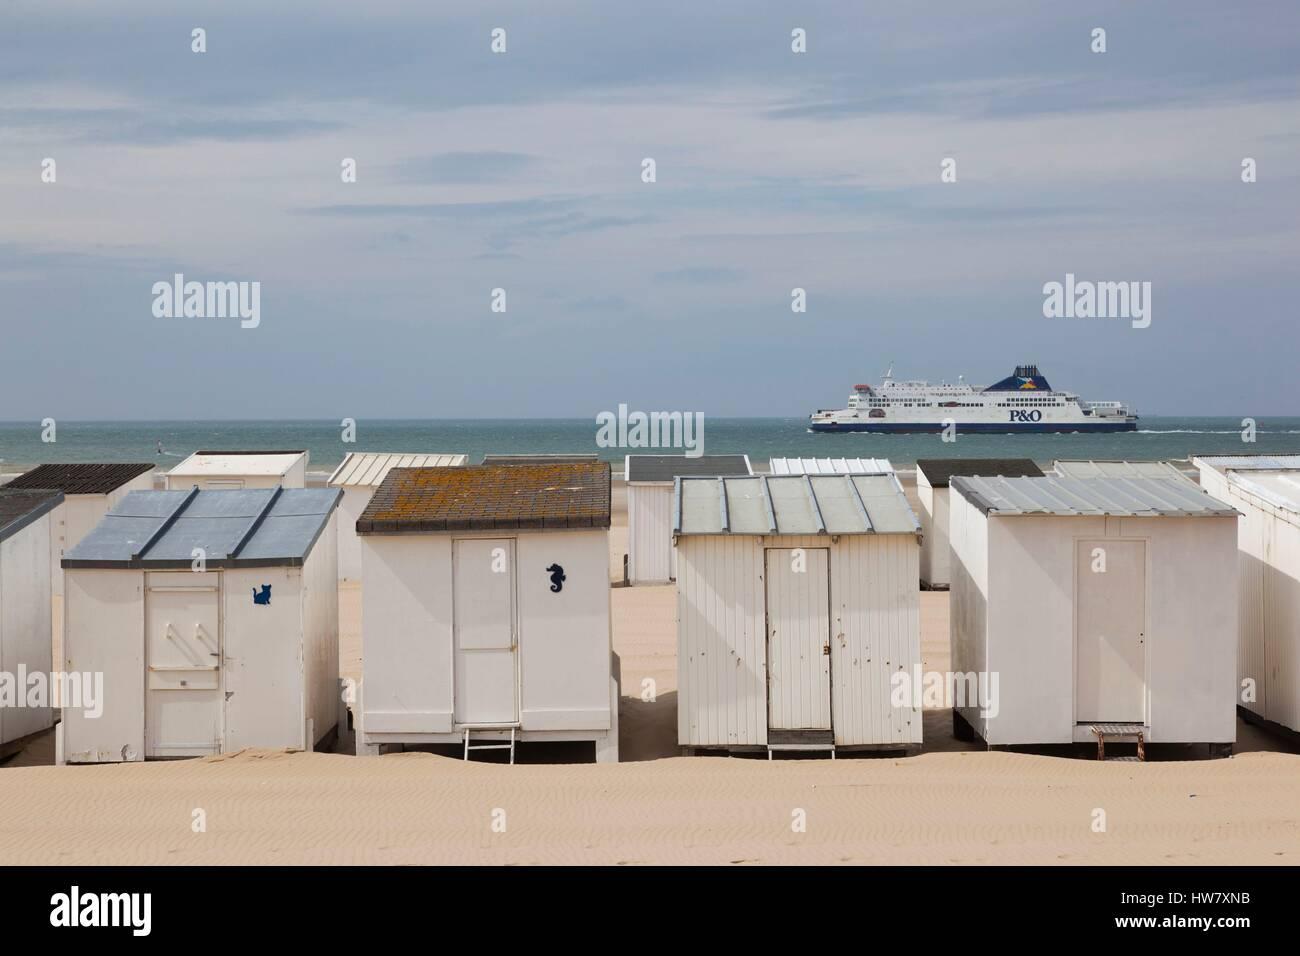 Frankreich, Pas-De-Calais, Bleriot-Plage, Strandhütten entlang Ärmelkanal mit Fähre Stockfoto